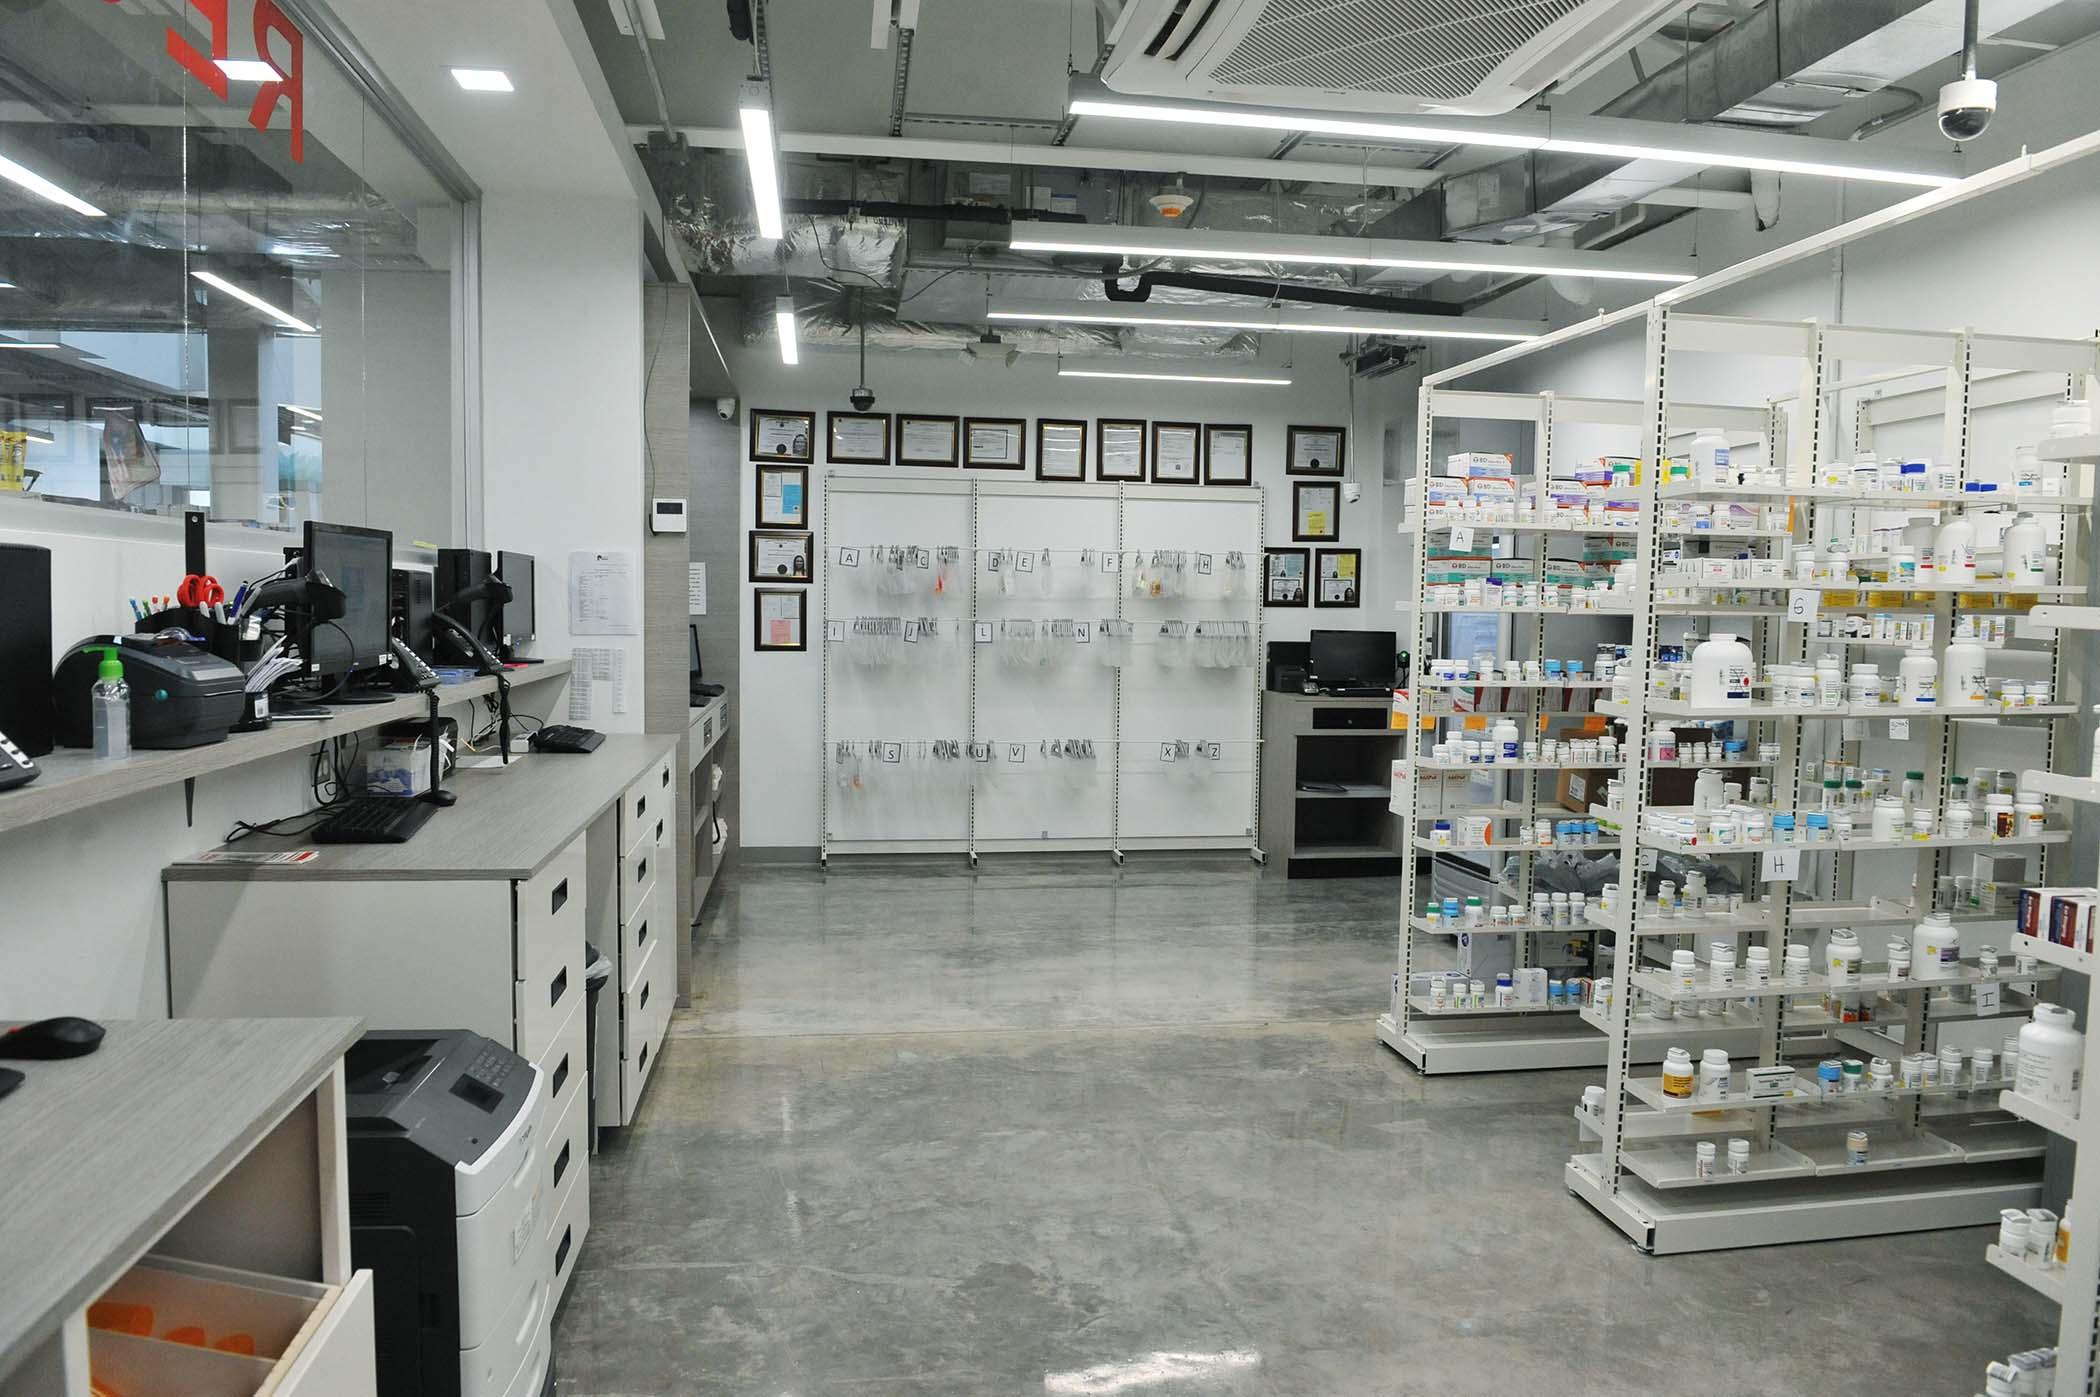 Inauguracion_Farmacias_Plaza-Plaza_del_Sol-24.jpg